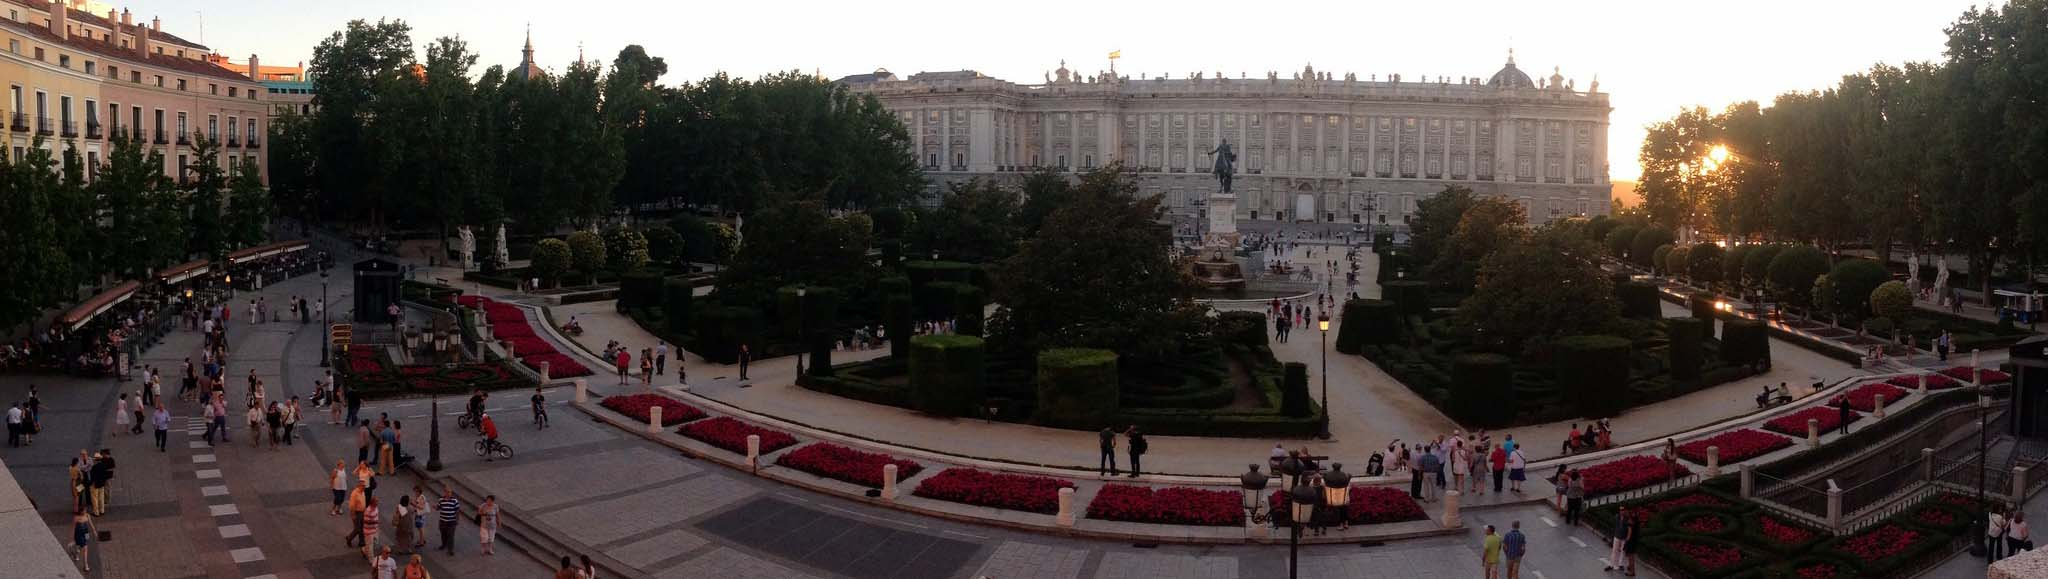 Площадь Пласа де Ориенте в Мадриде